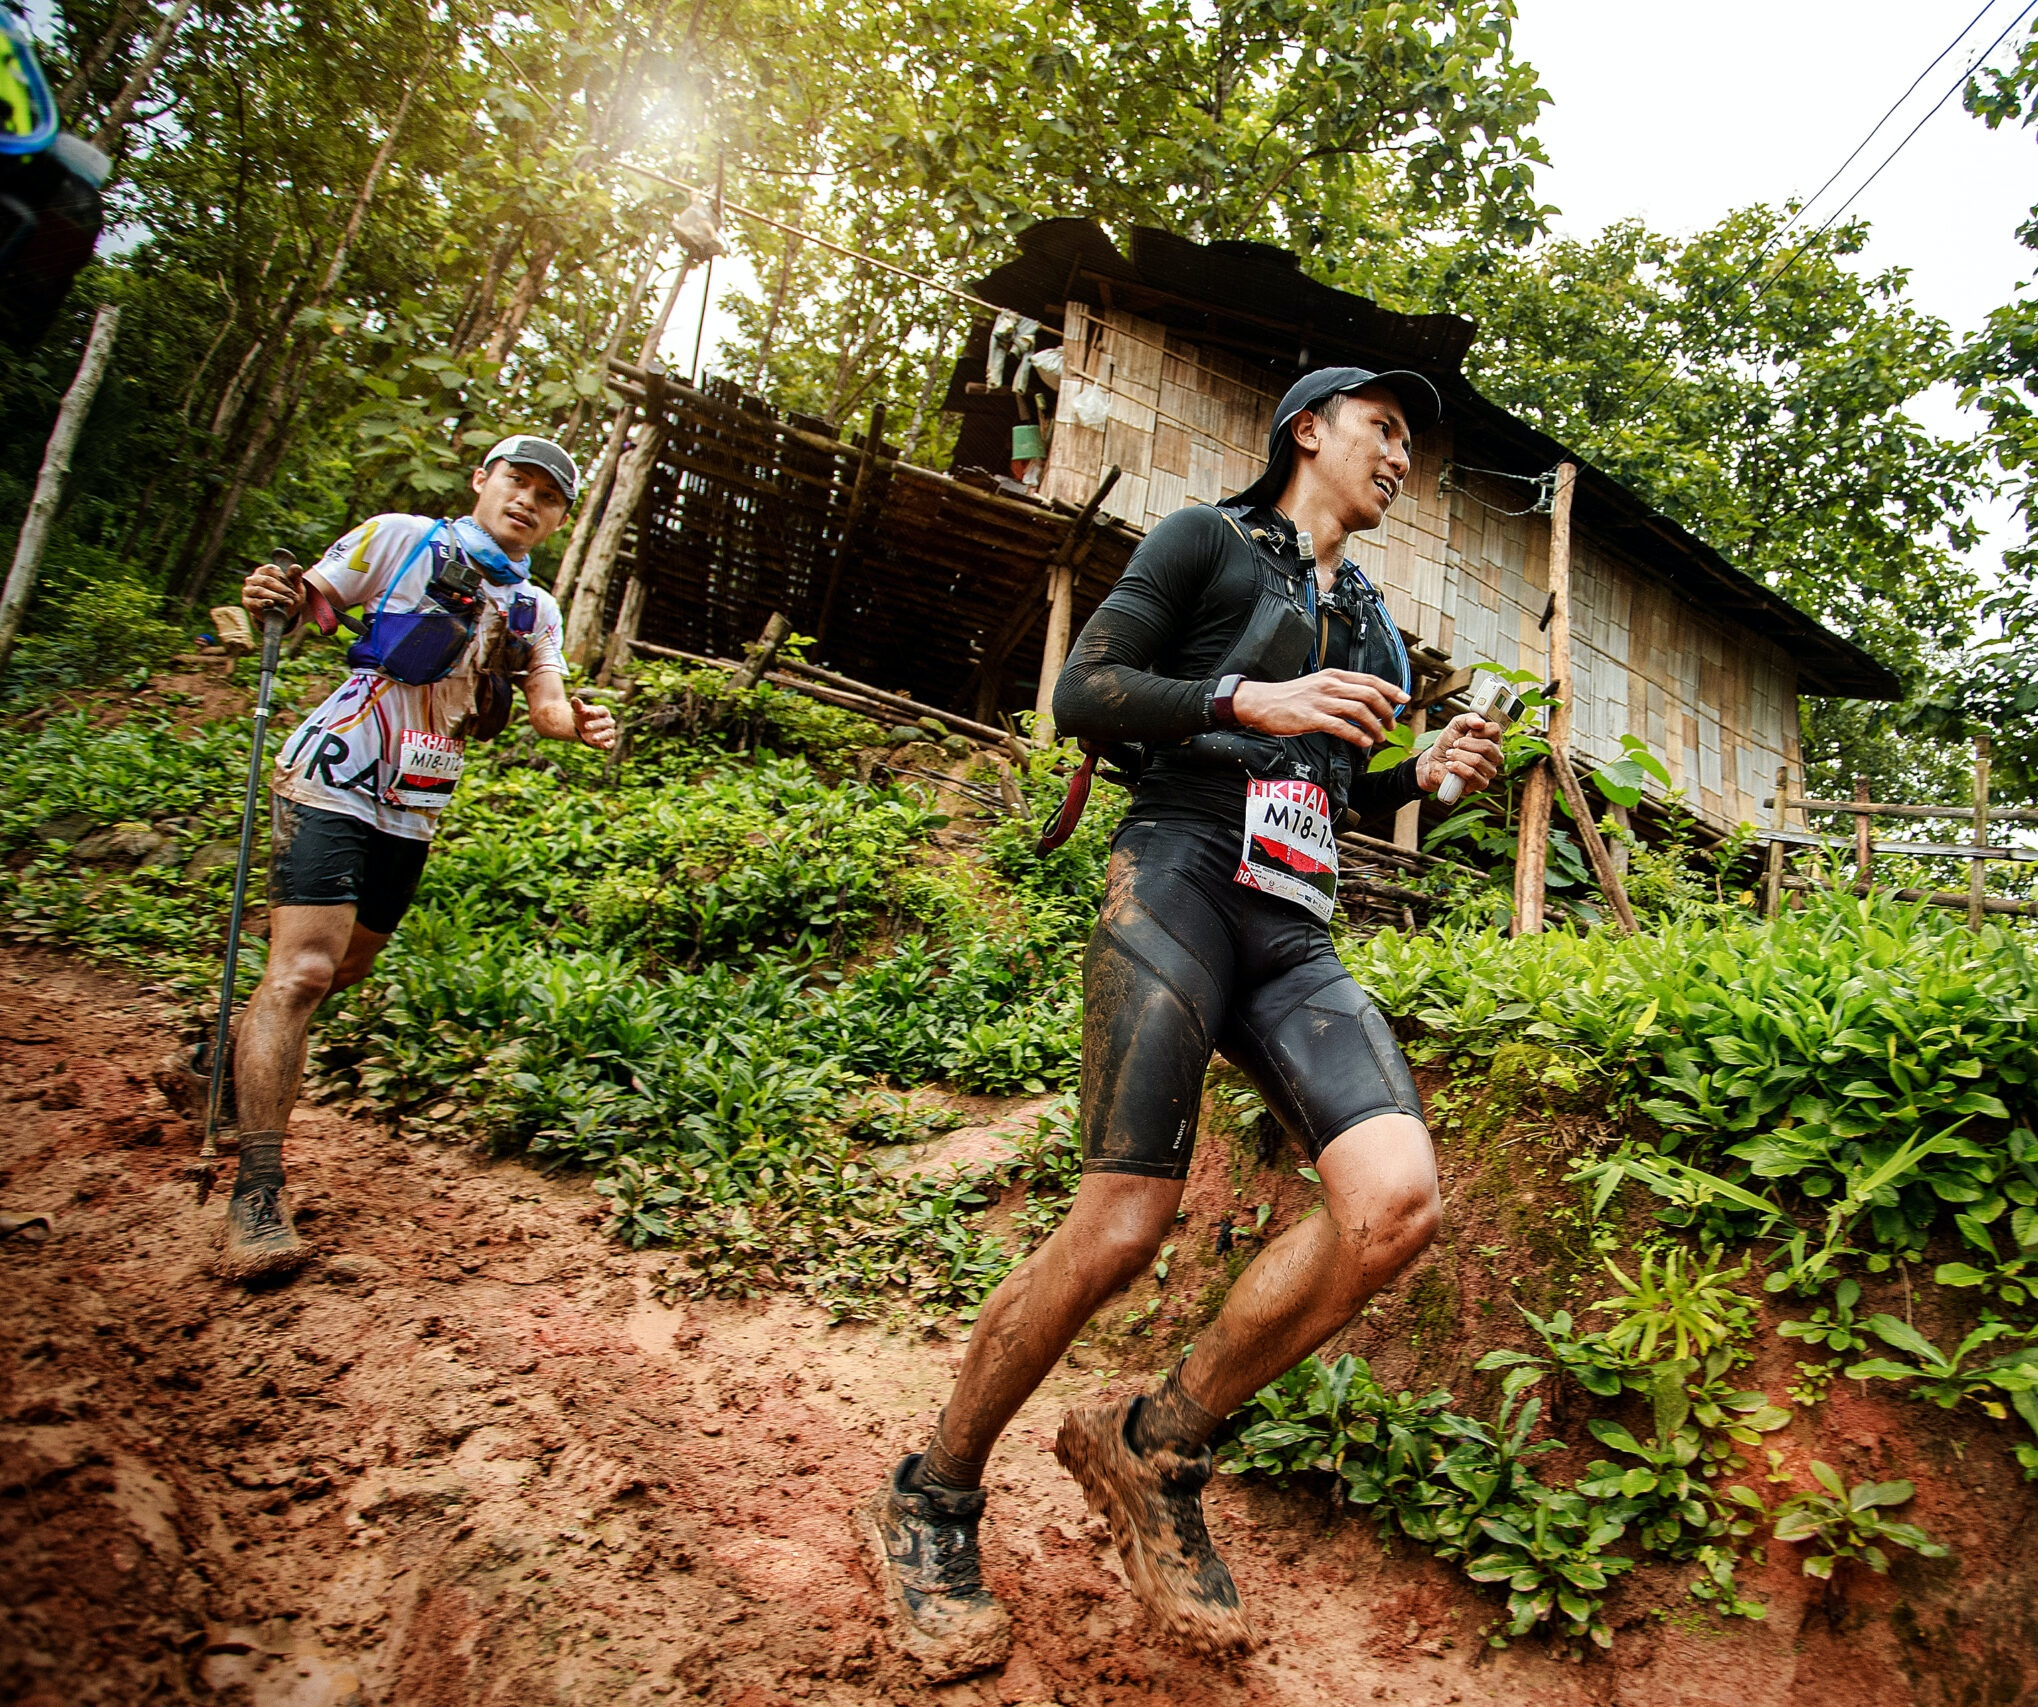 trail-runnning-วิ่งเทรล